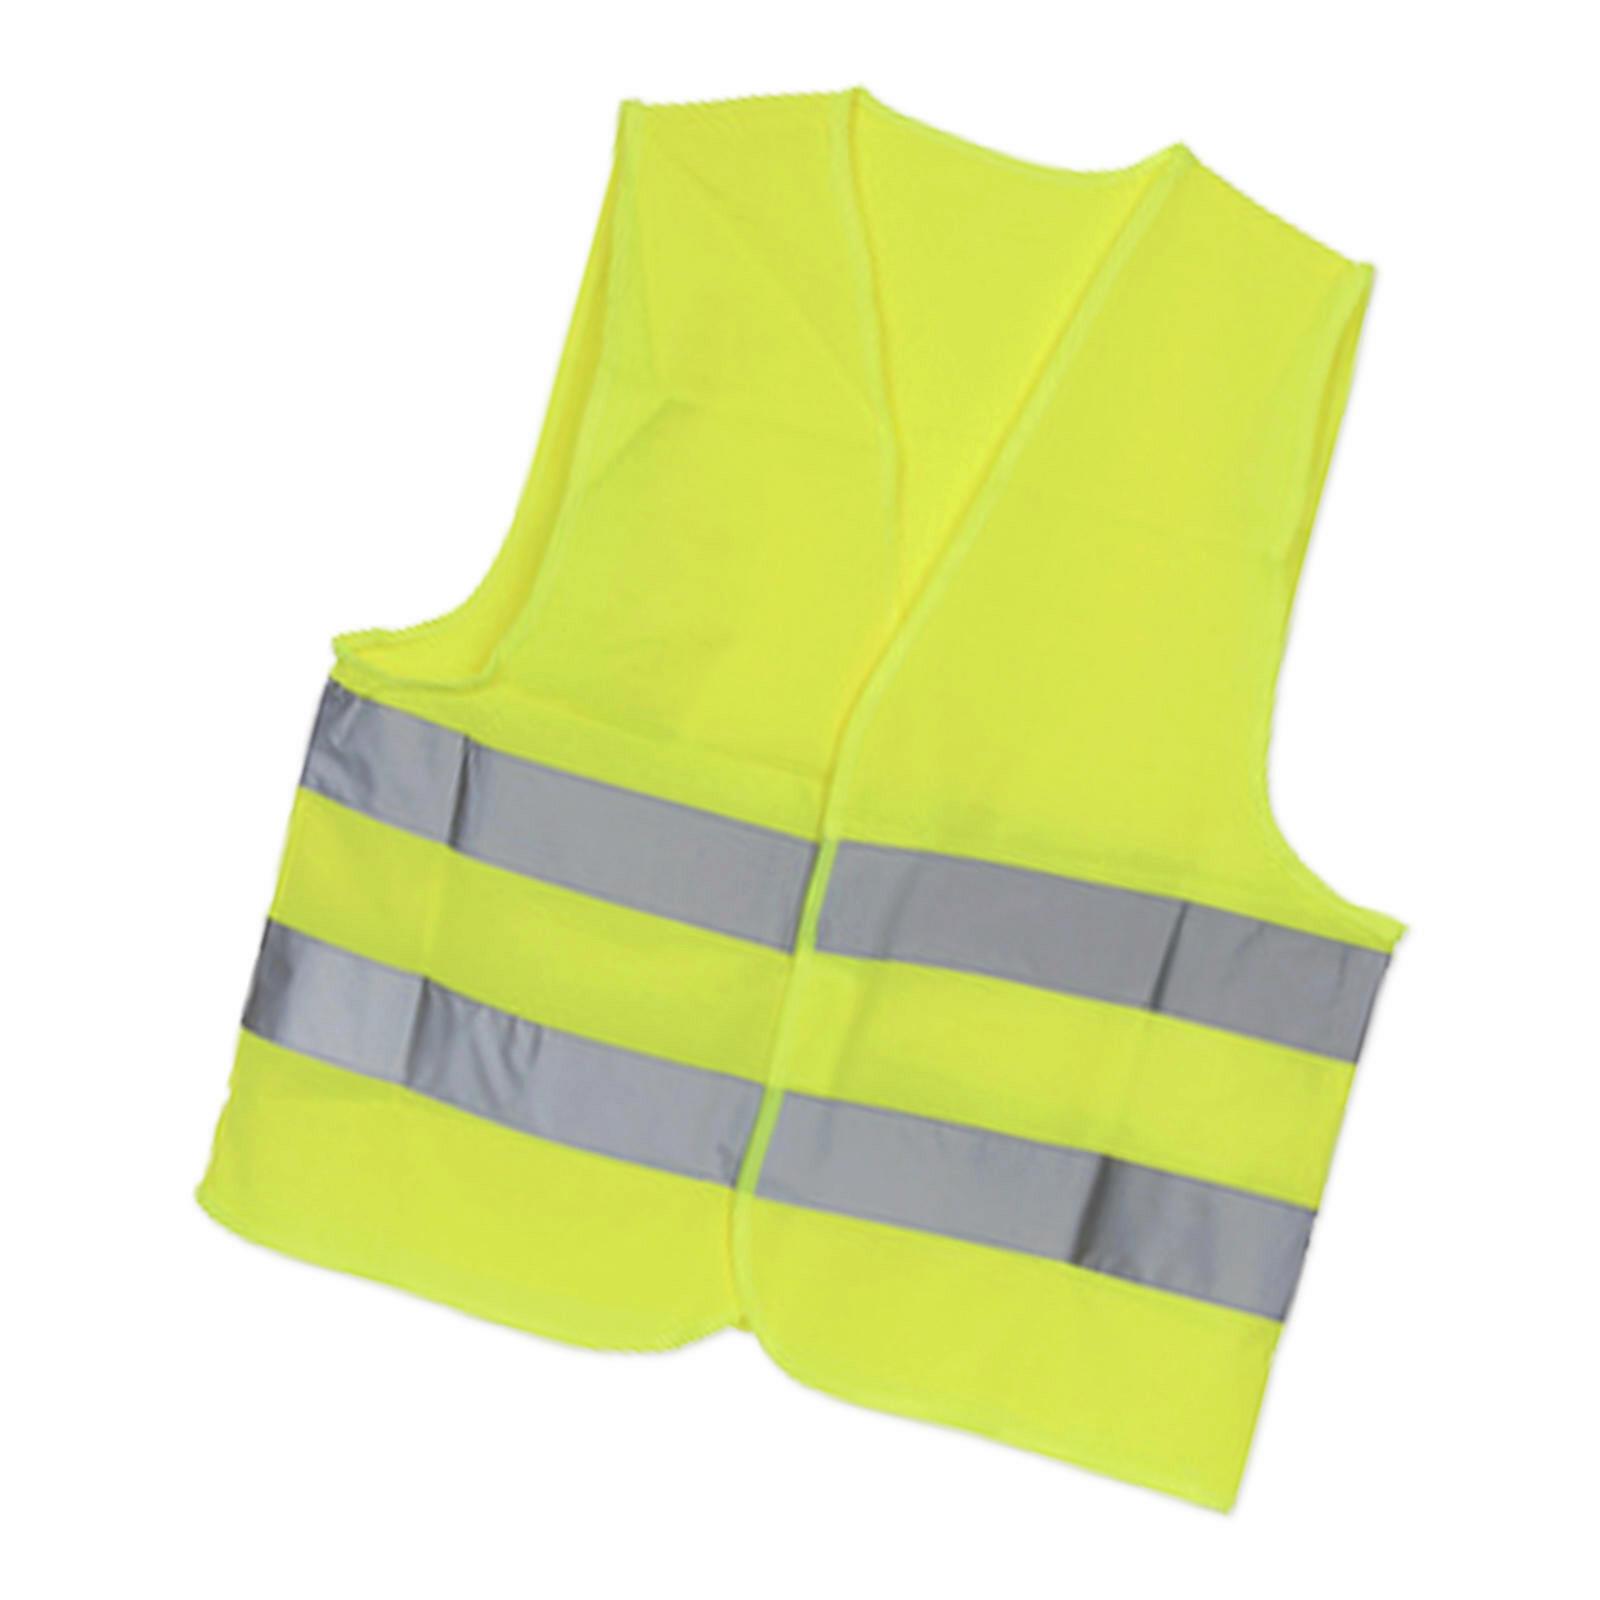 Kinderwarnweste Gelb